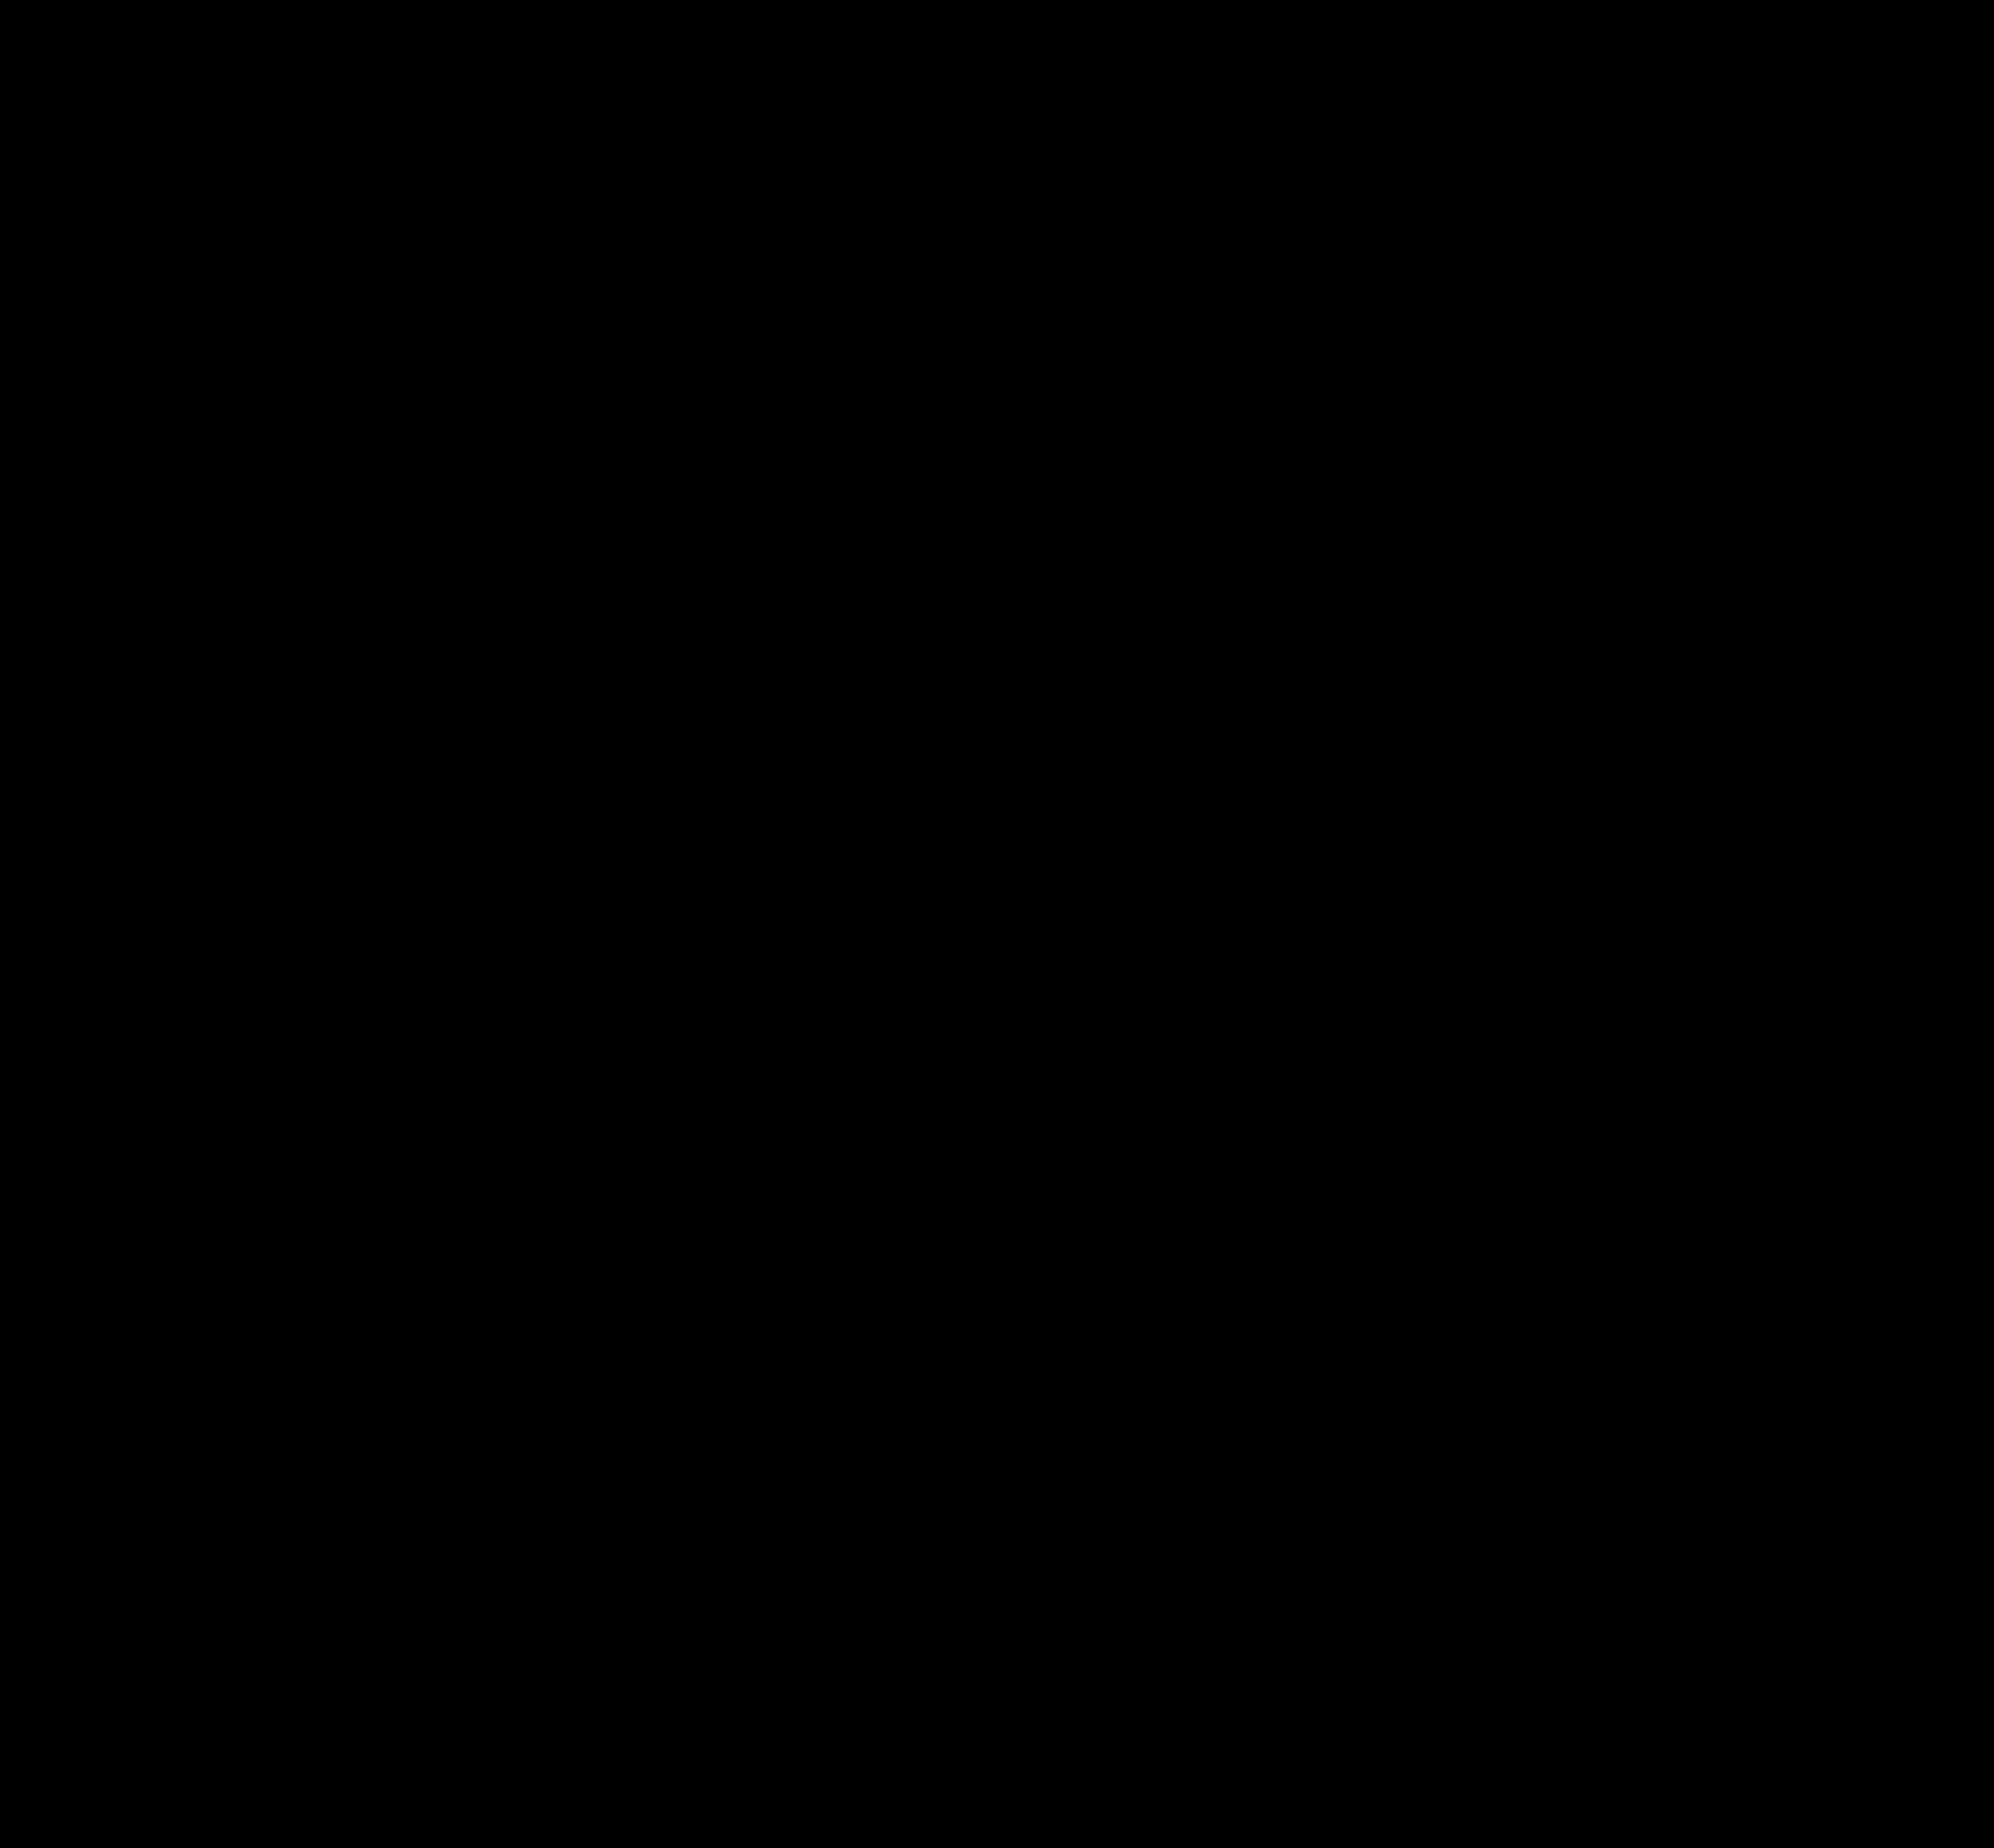 Video Camera Clipart-Video Camera Clipart-16